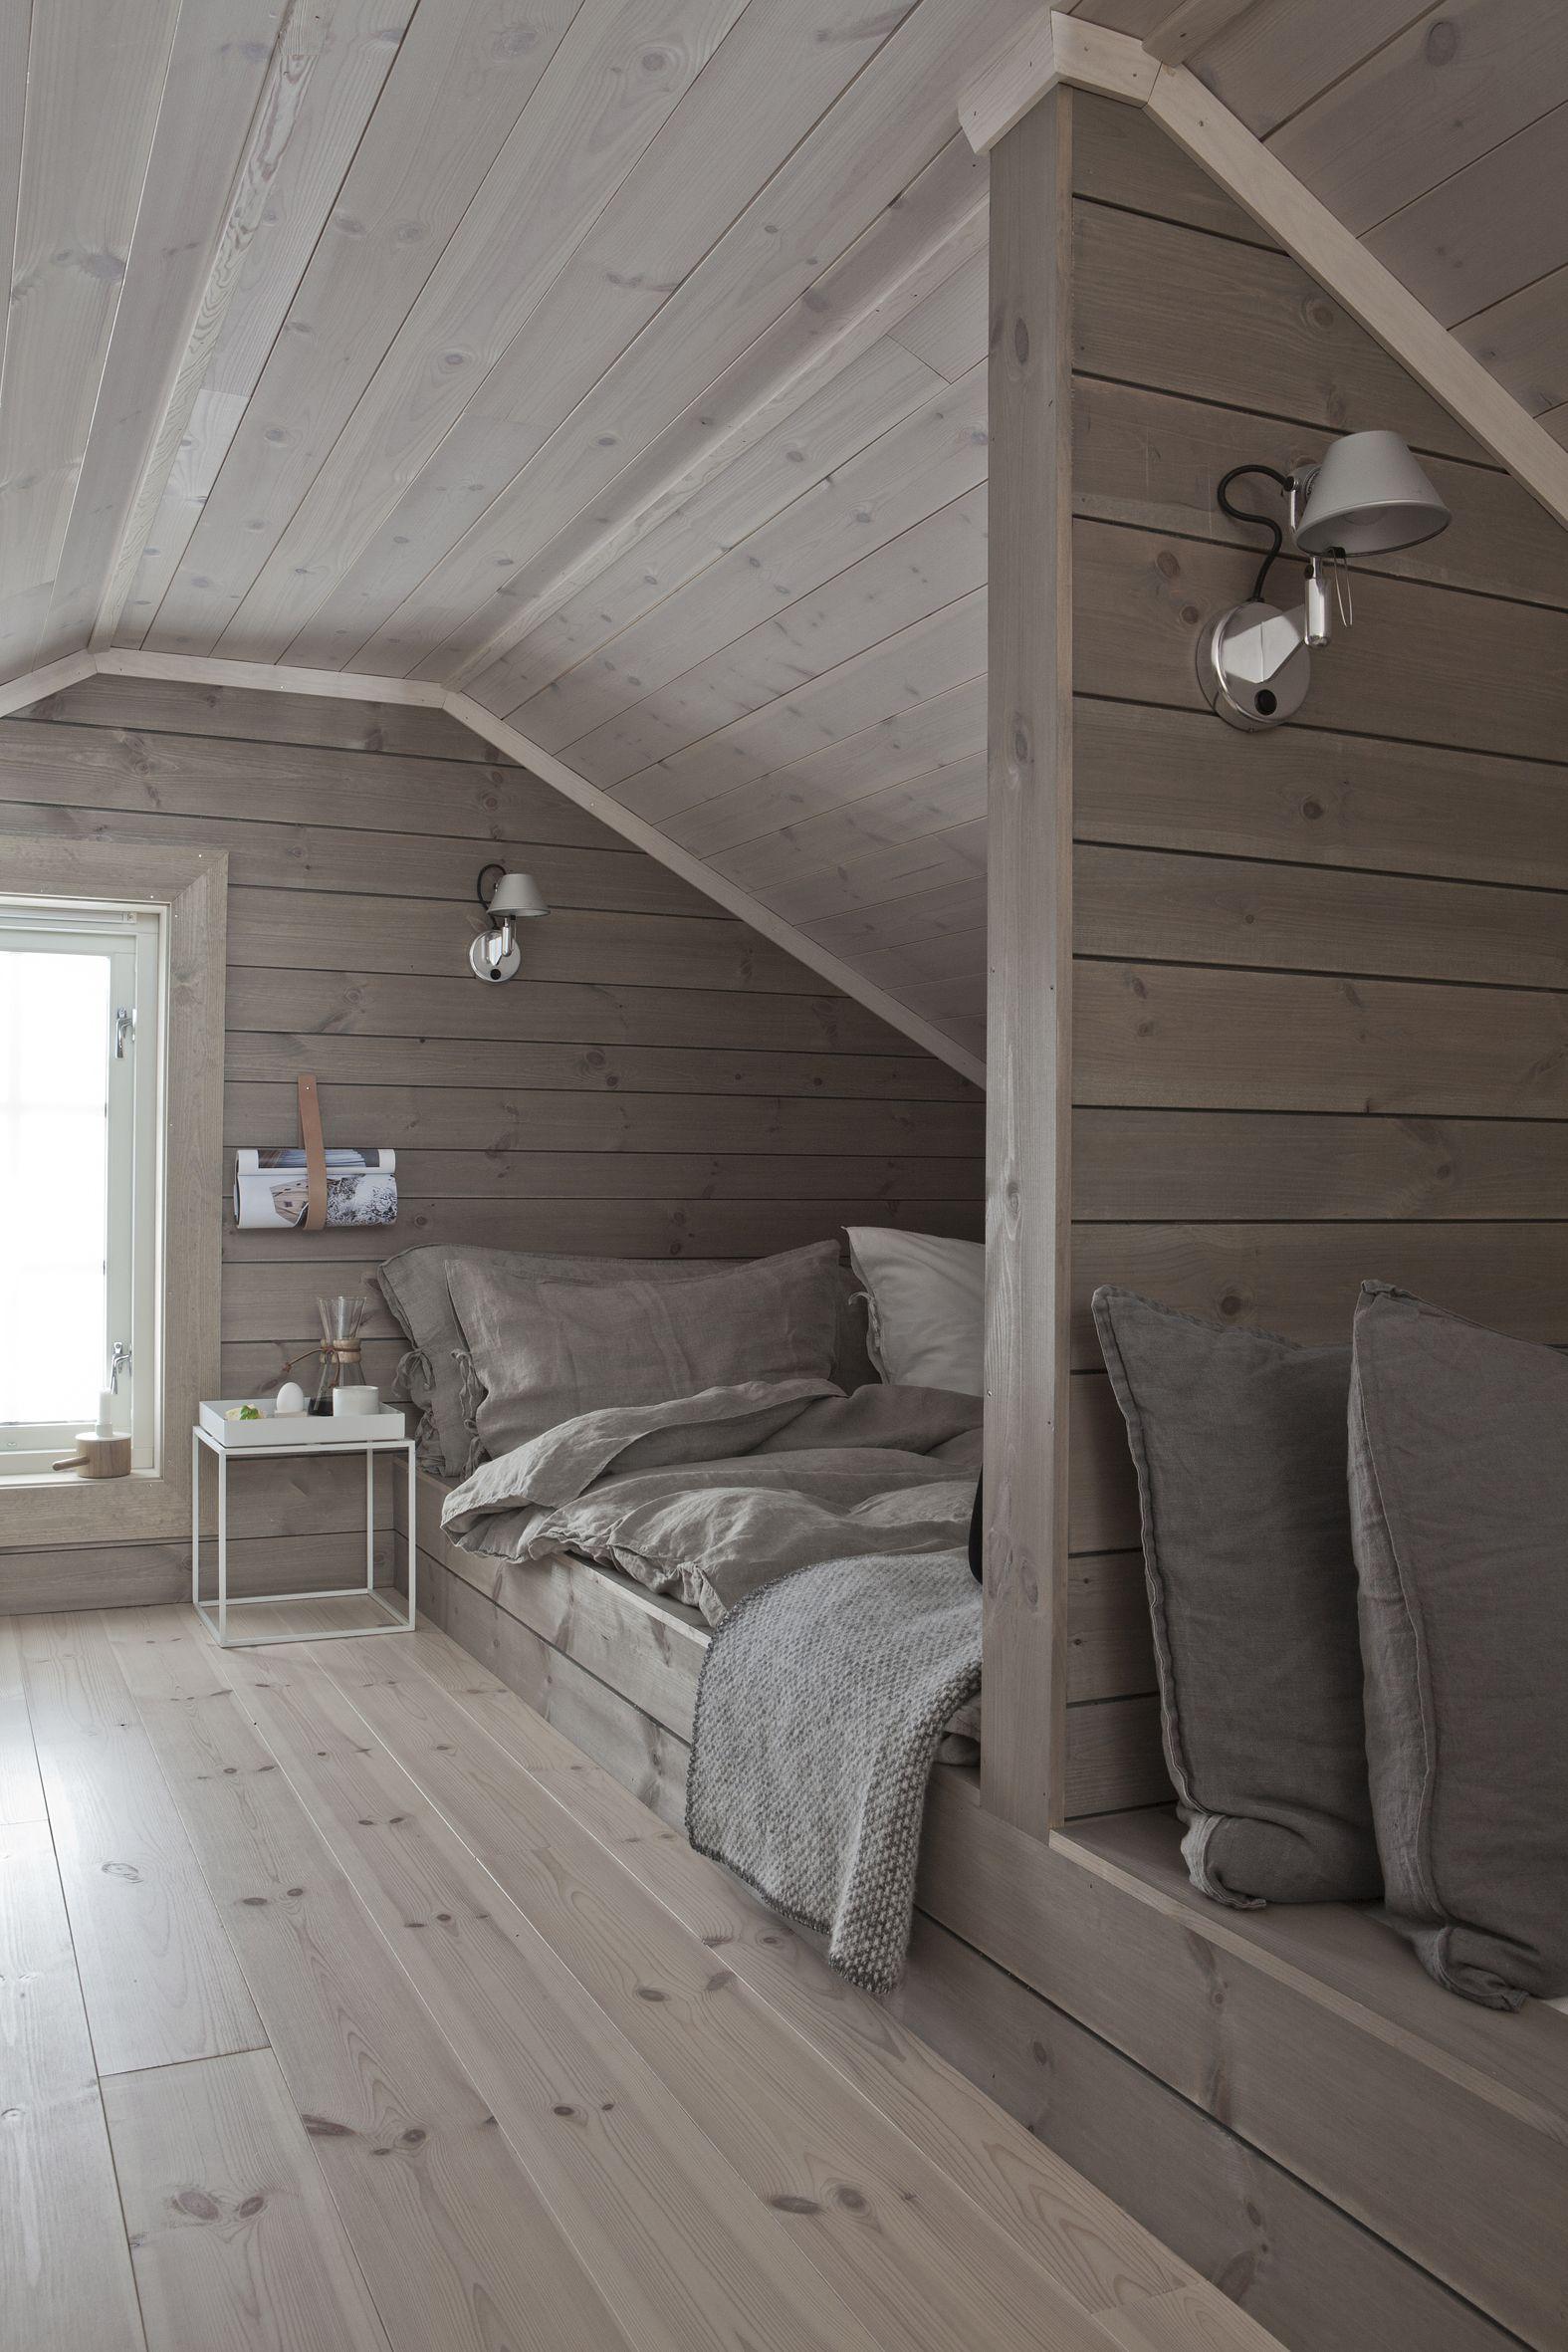 amusing attic loft interior design | Idea of 4th bedroom being a loft as a small 3rd level ...